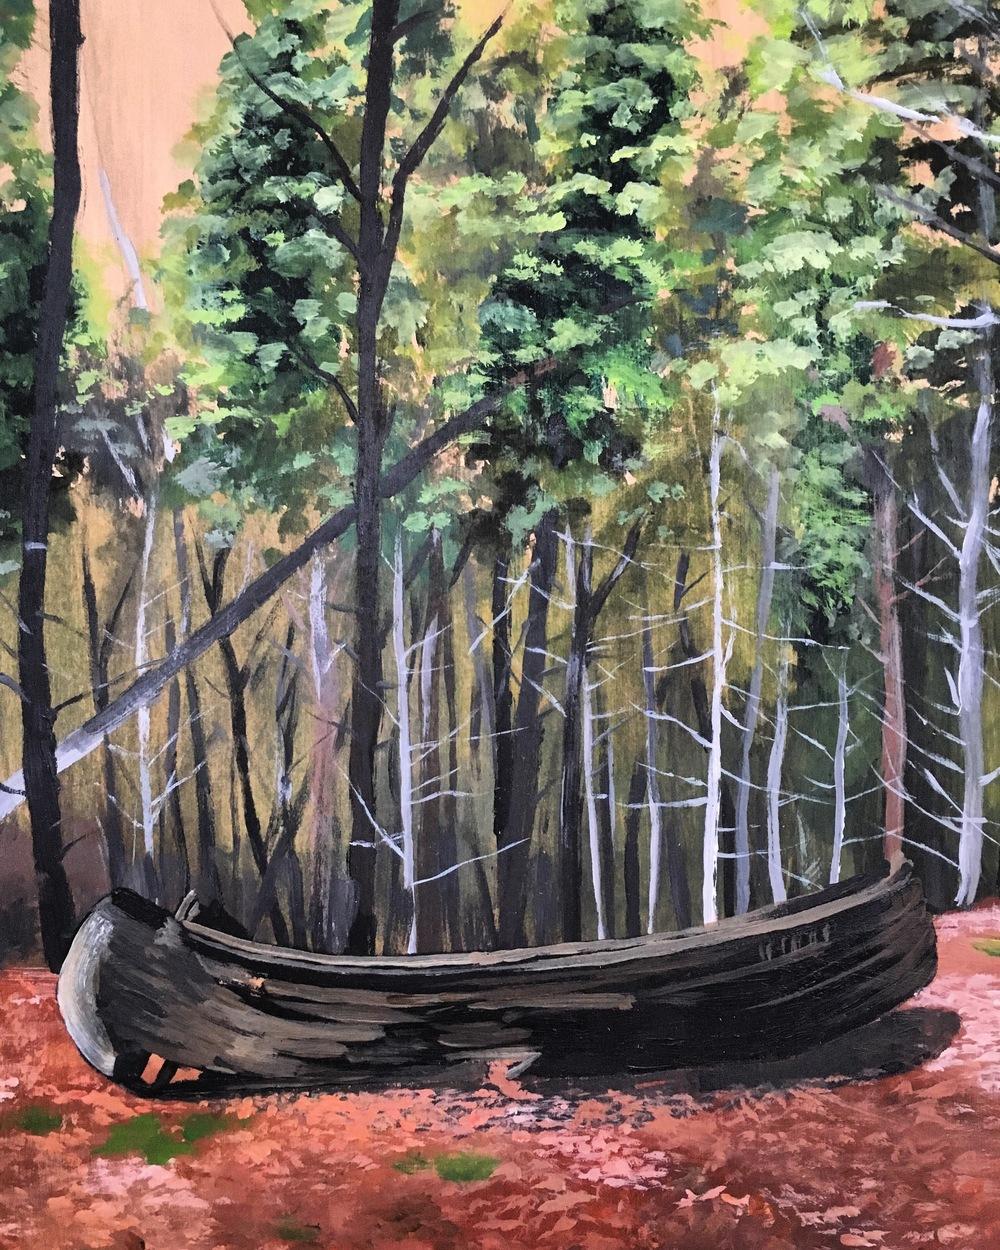 "Canoe Place    acrylic on wood panel  10"" x 8""  2015  (sold)"